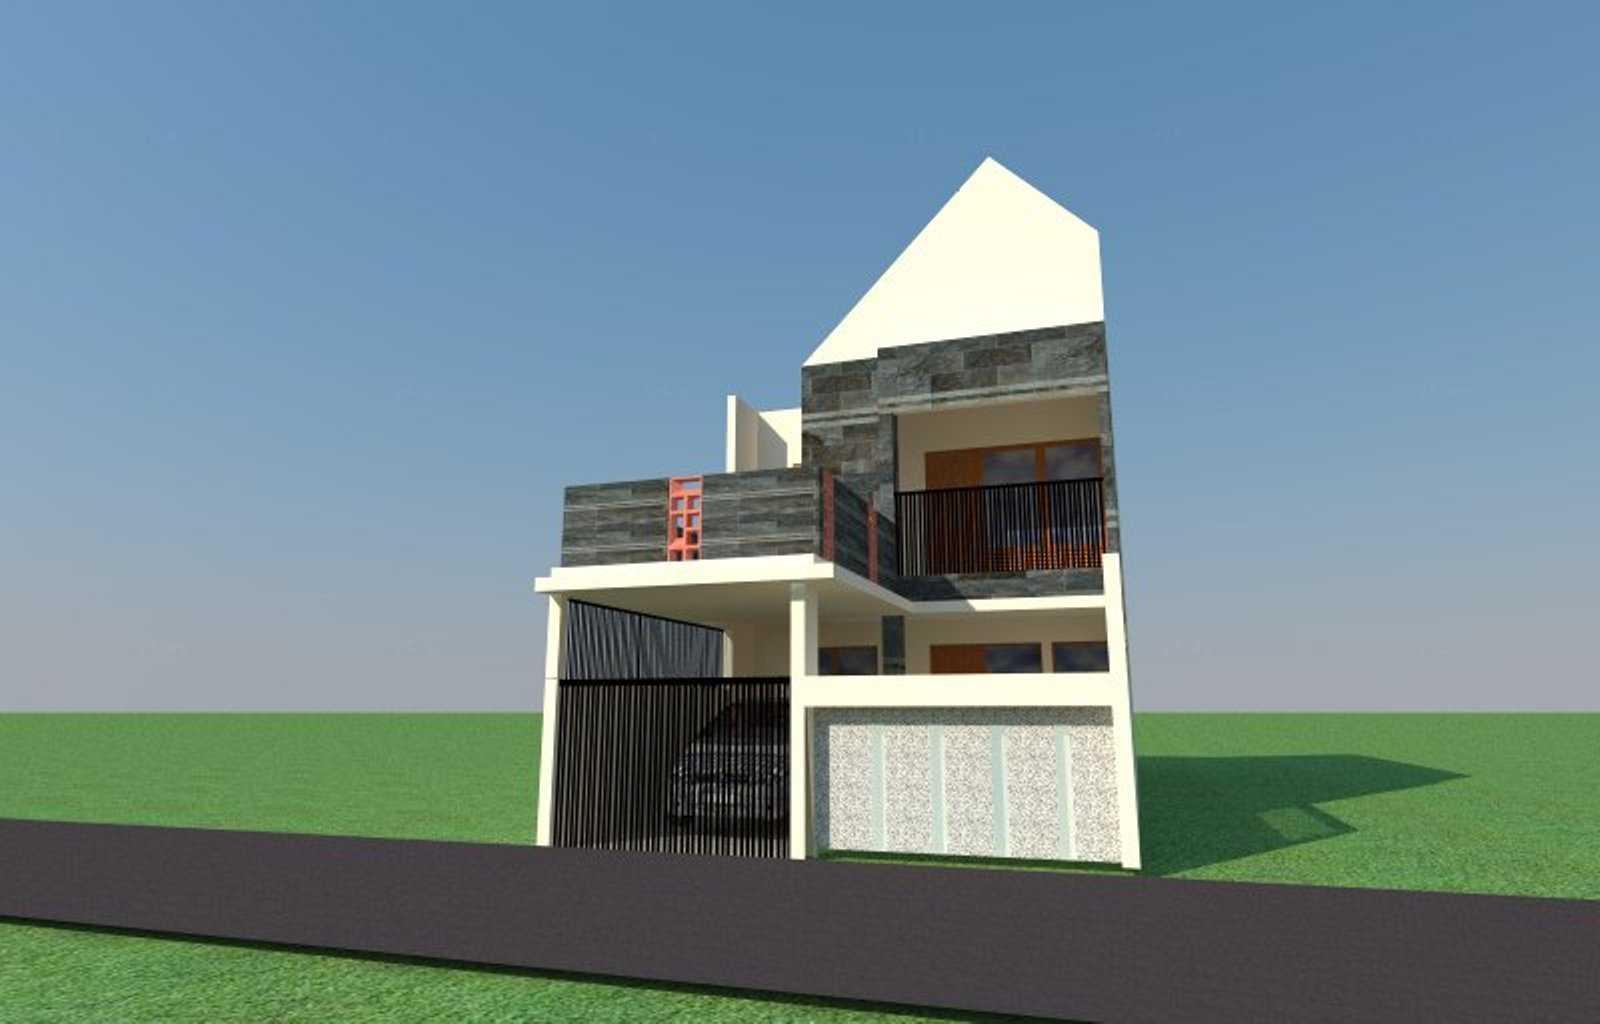 Sujud Gunawan Studio House Vmv Cileungsi, Bogor, Jawa Barat, Indonesia Cileungsi A6 Kontemporer  13764